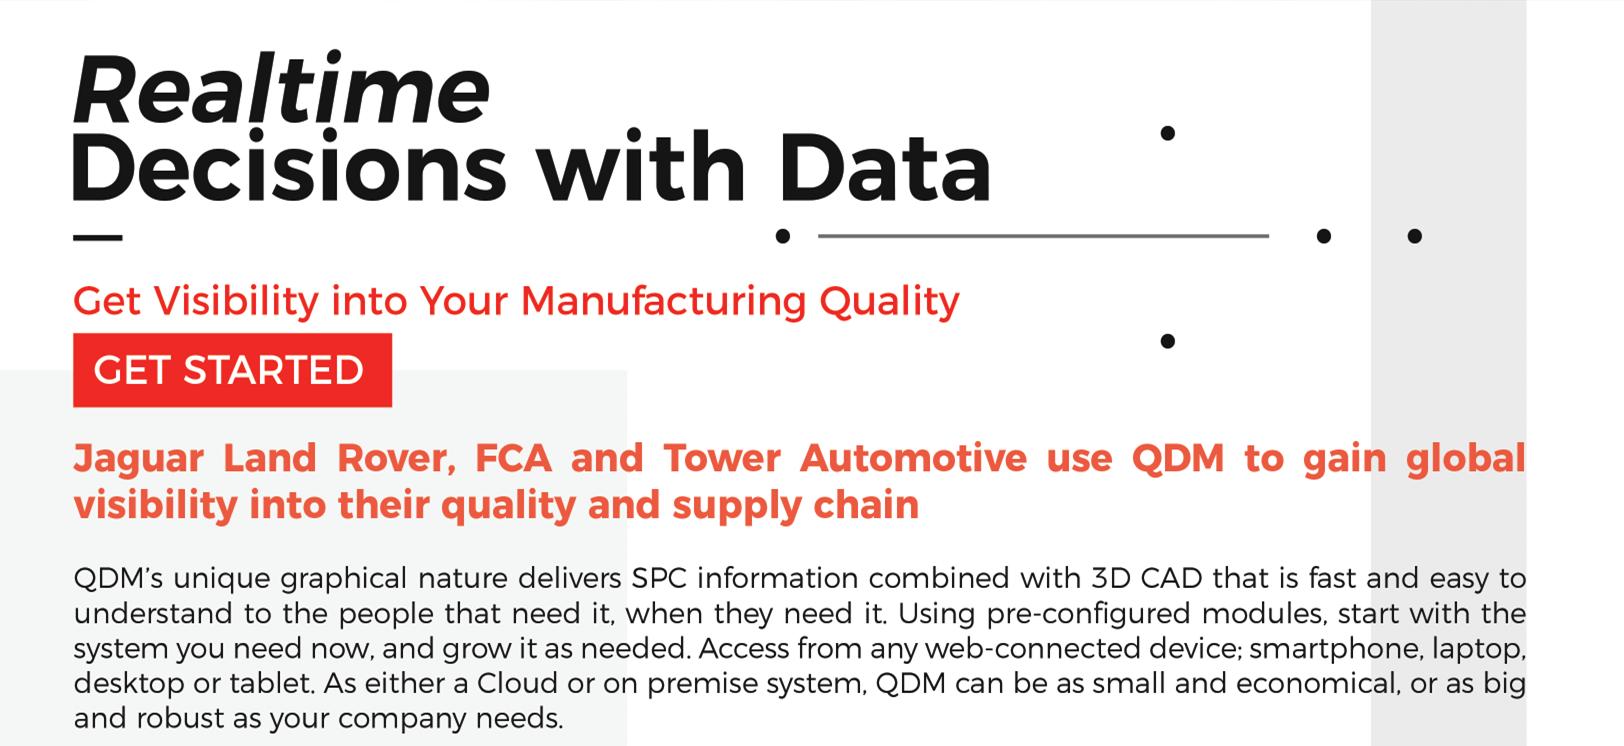 dcs-qdm-realtime-decision-making